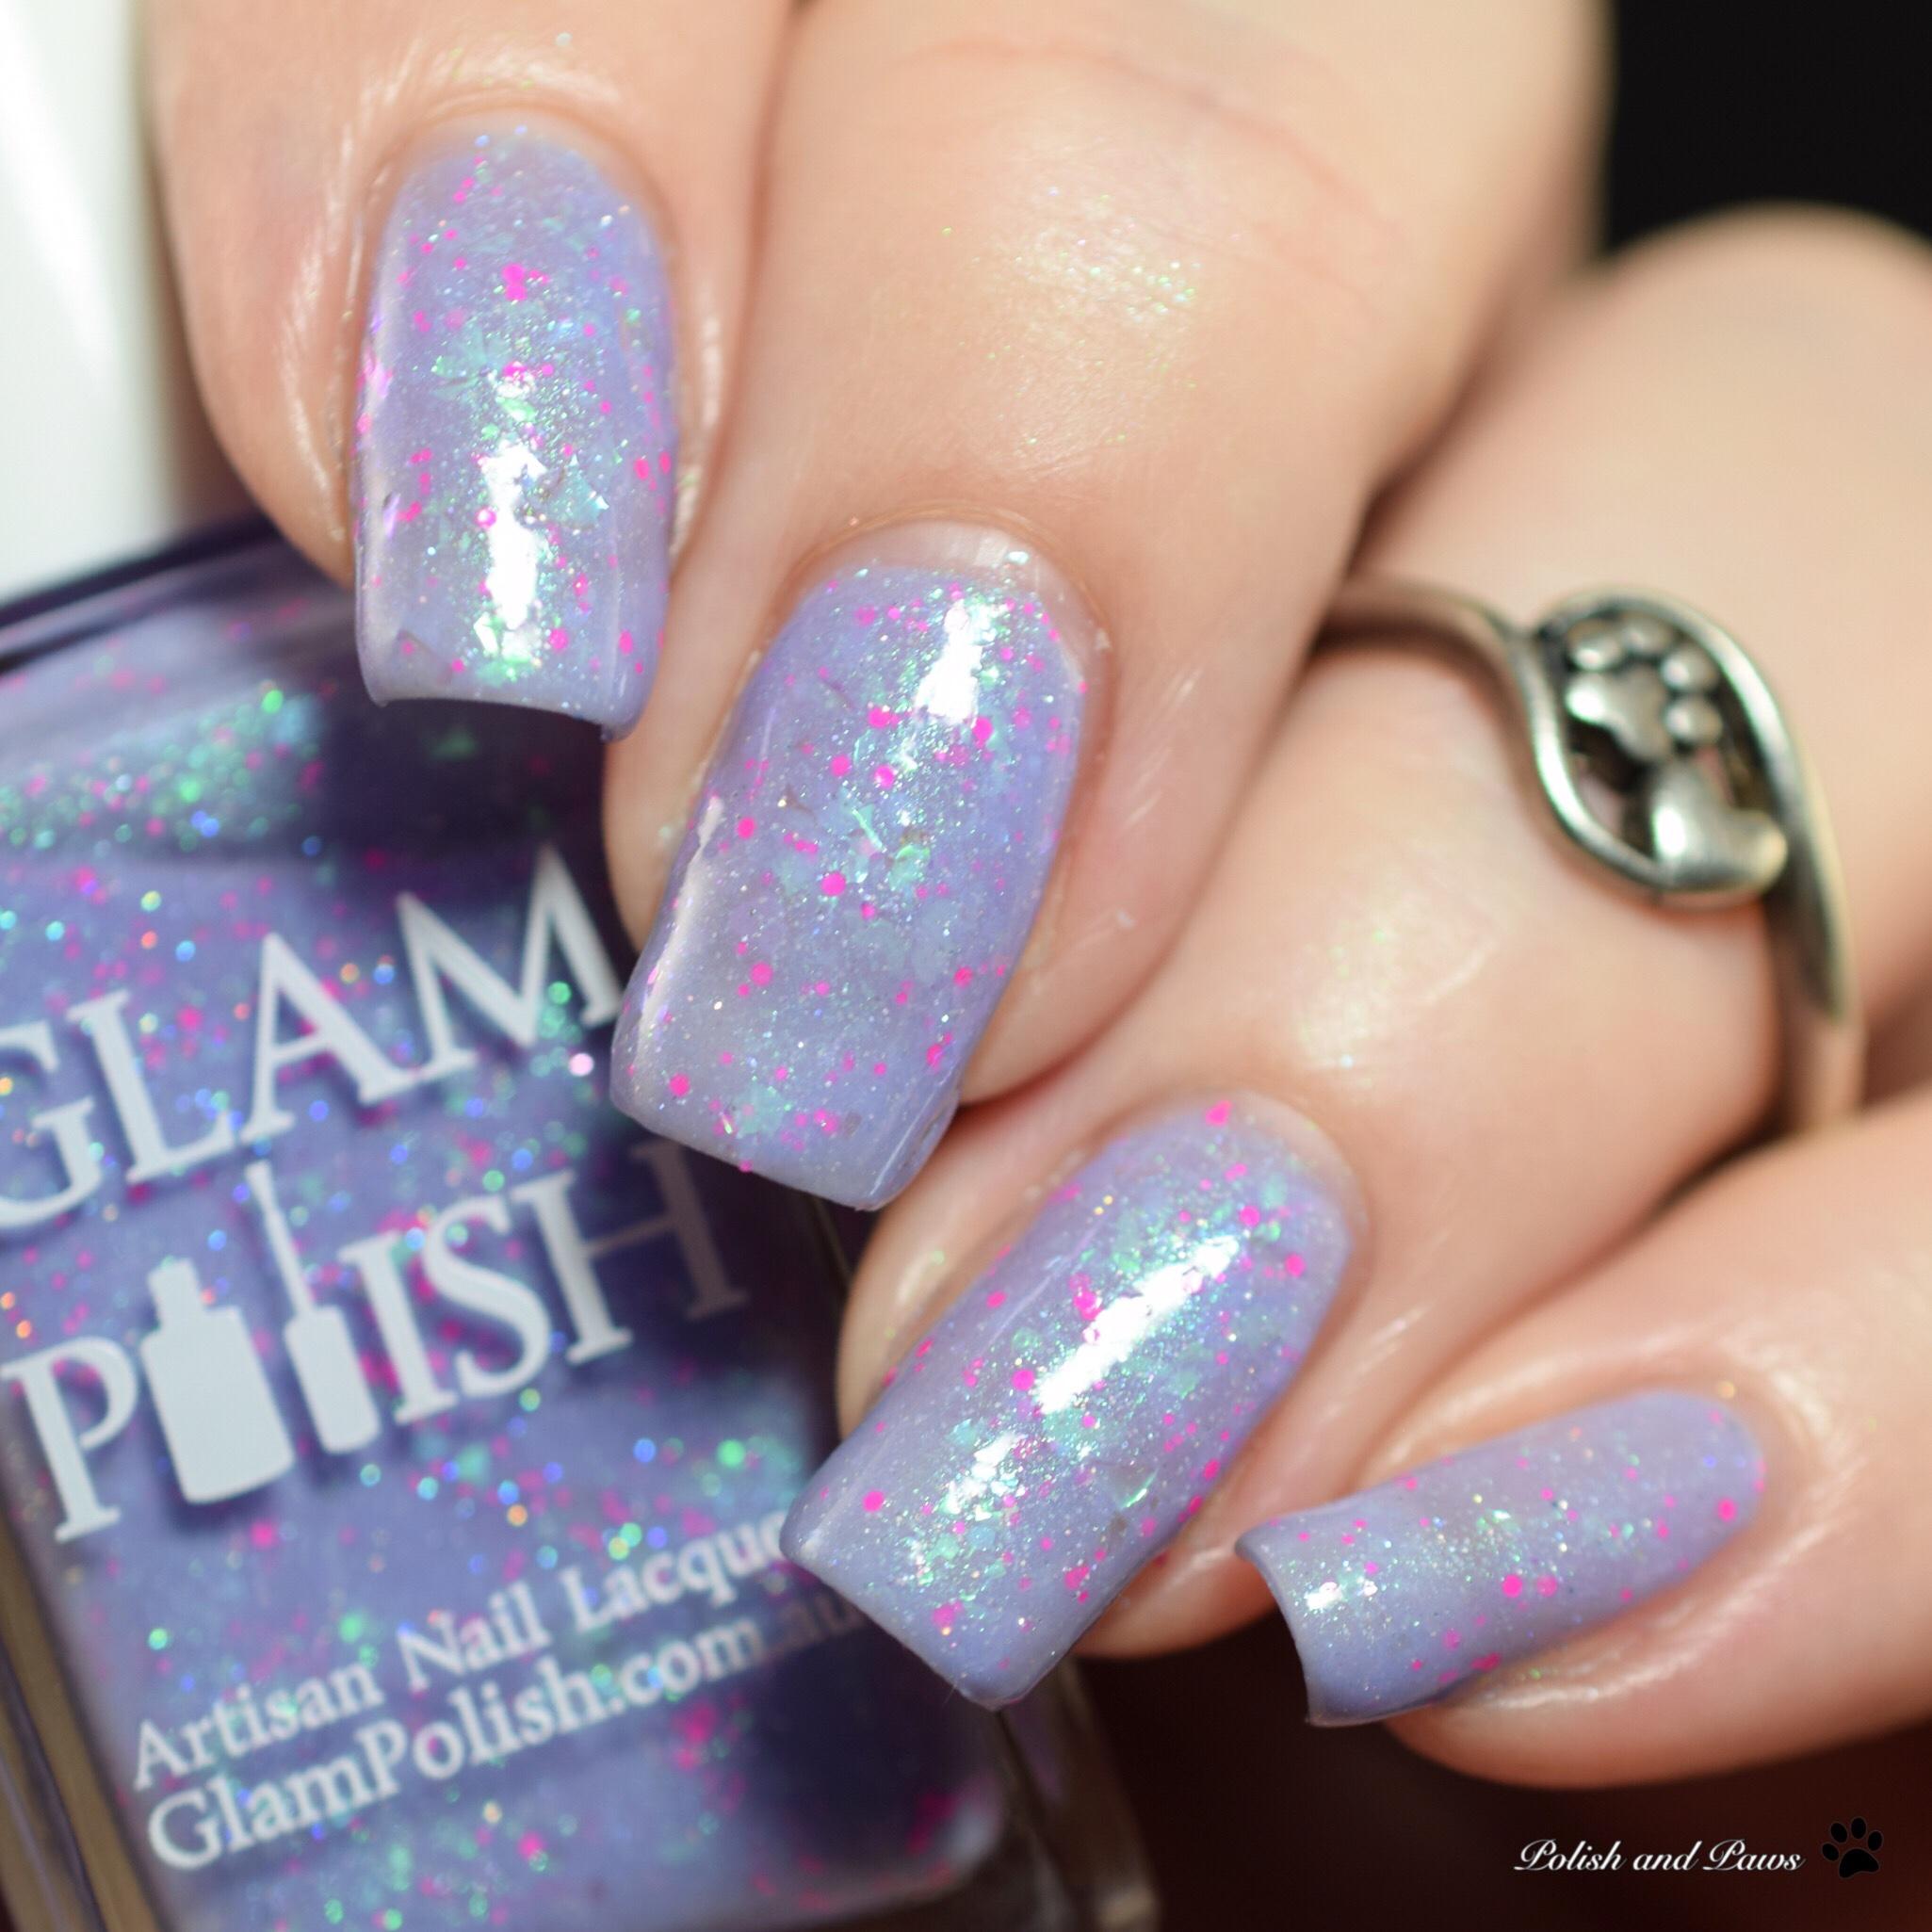 Glam Polish Always be a Unicorn